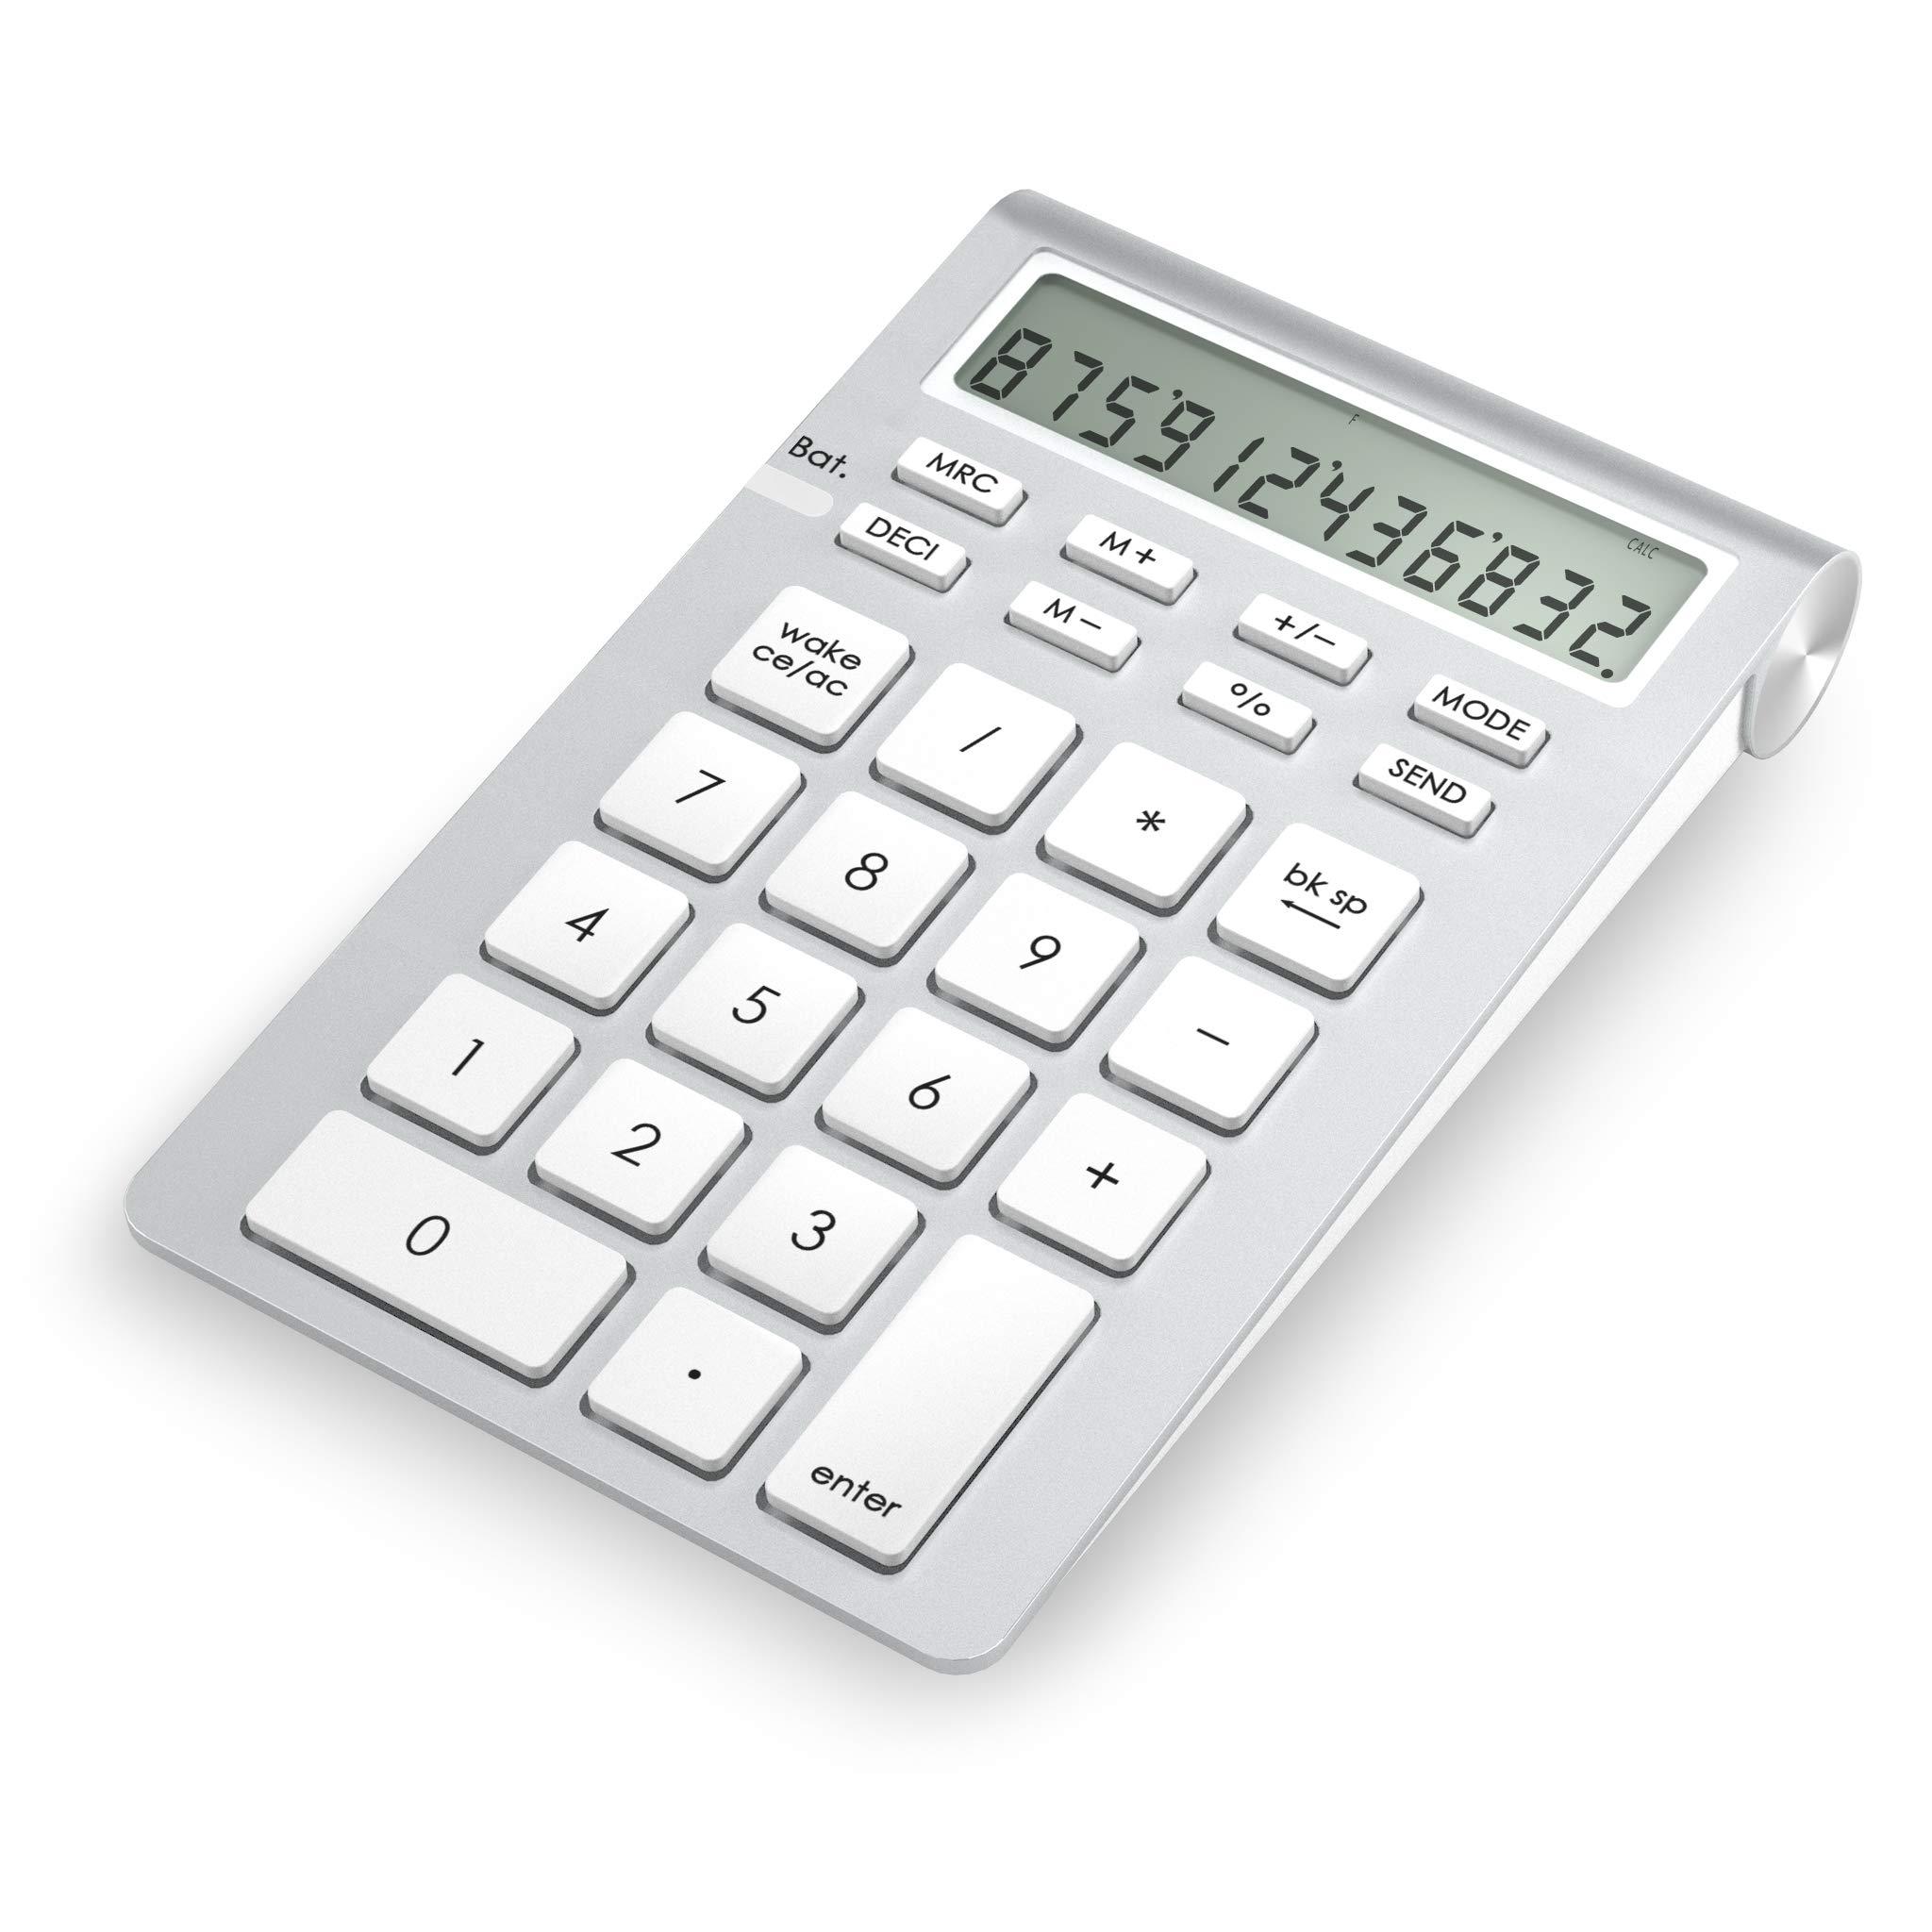 Cateck Wireless Bluetooth Numeric Smart Keypad with Calculator for iMac, MacBooks, PCs, Bluetooth Numeric keypad for Laptop, Wireless 10 Key Number pad for mac, Ten Key MacBook pro Calculator